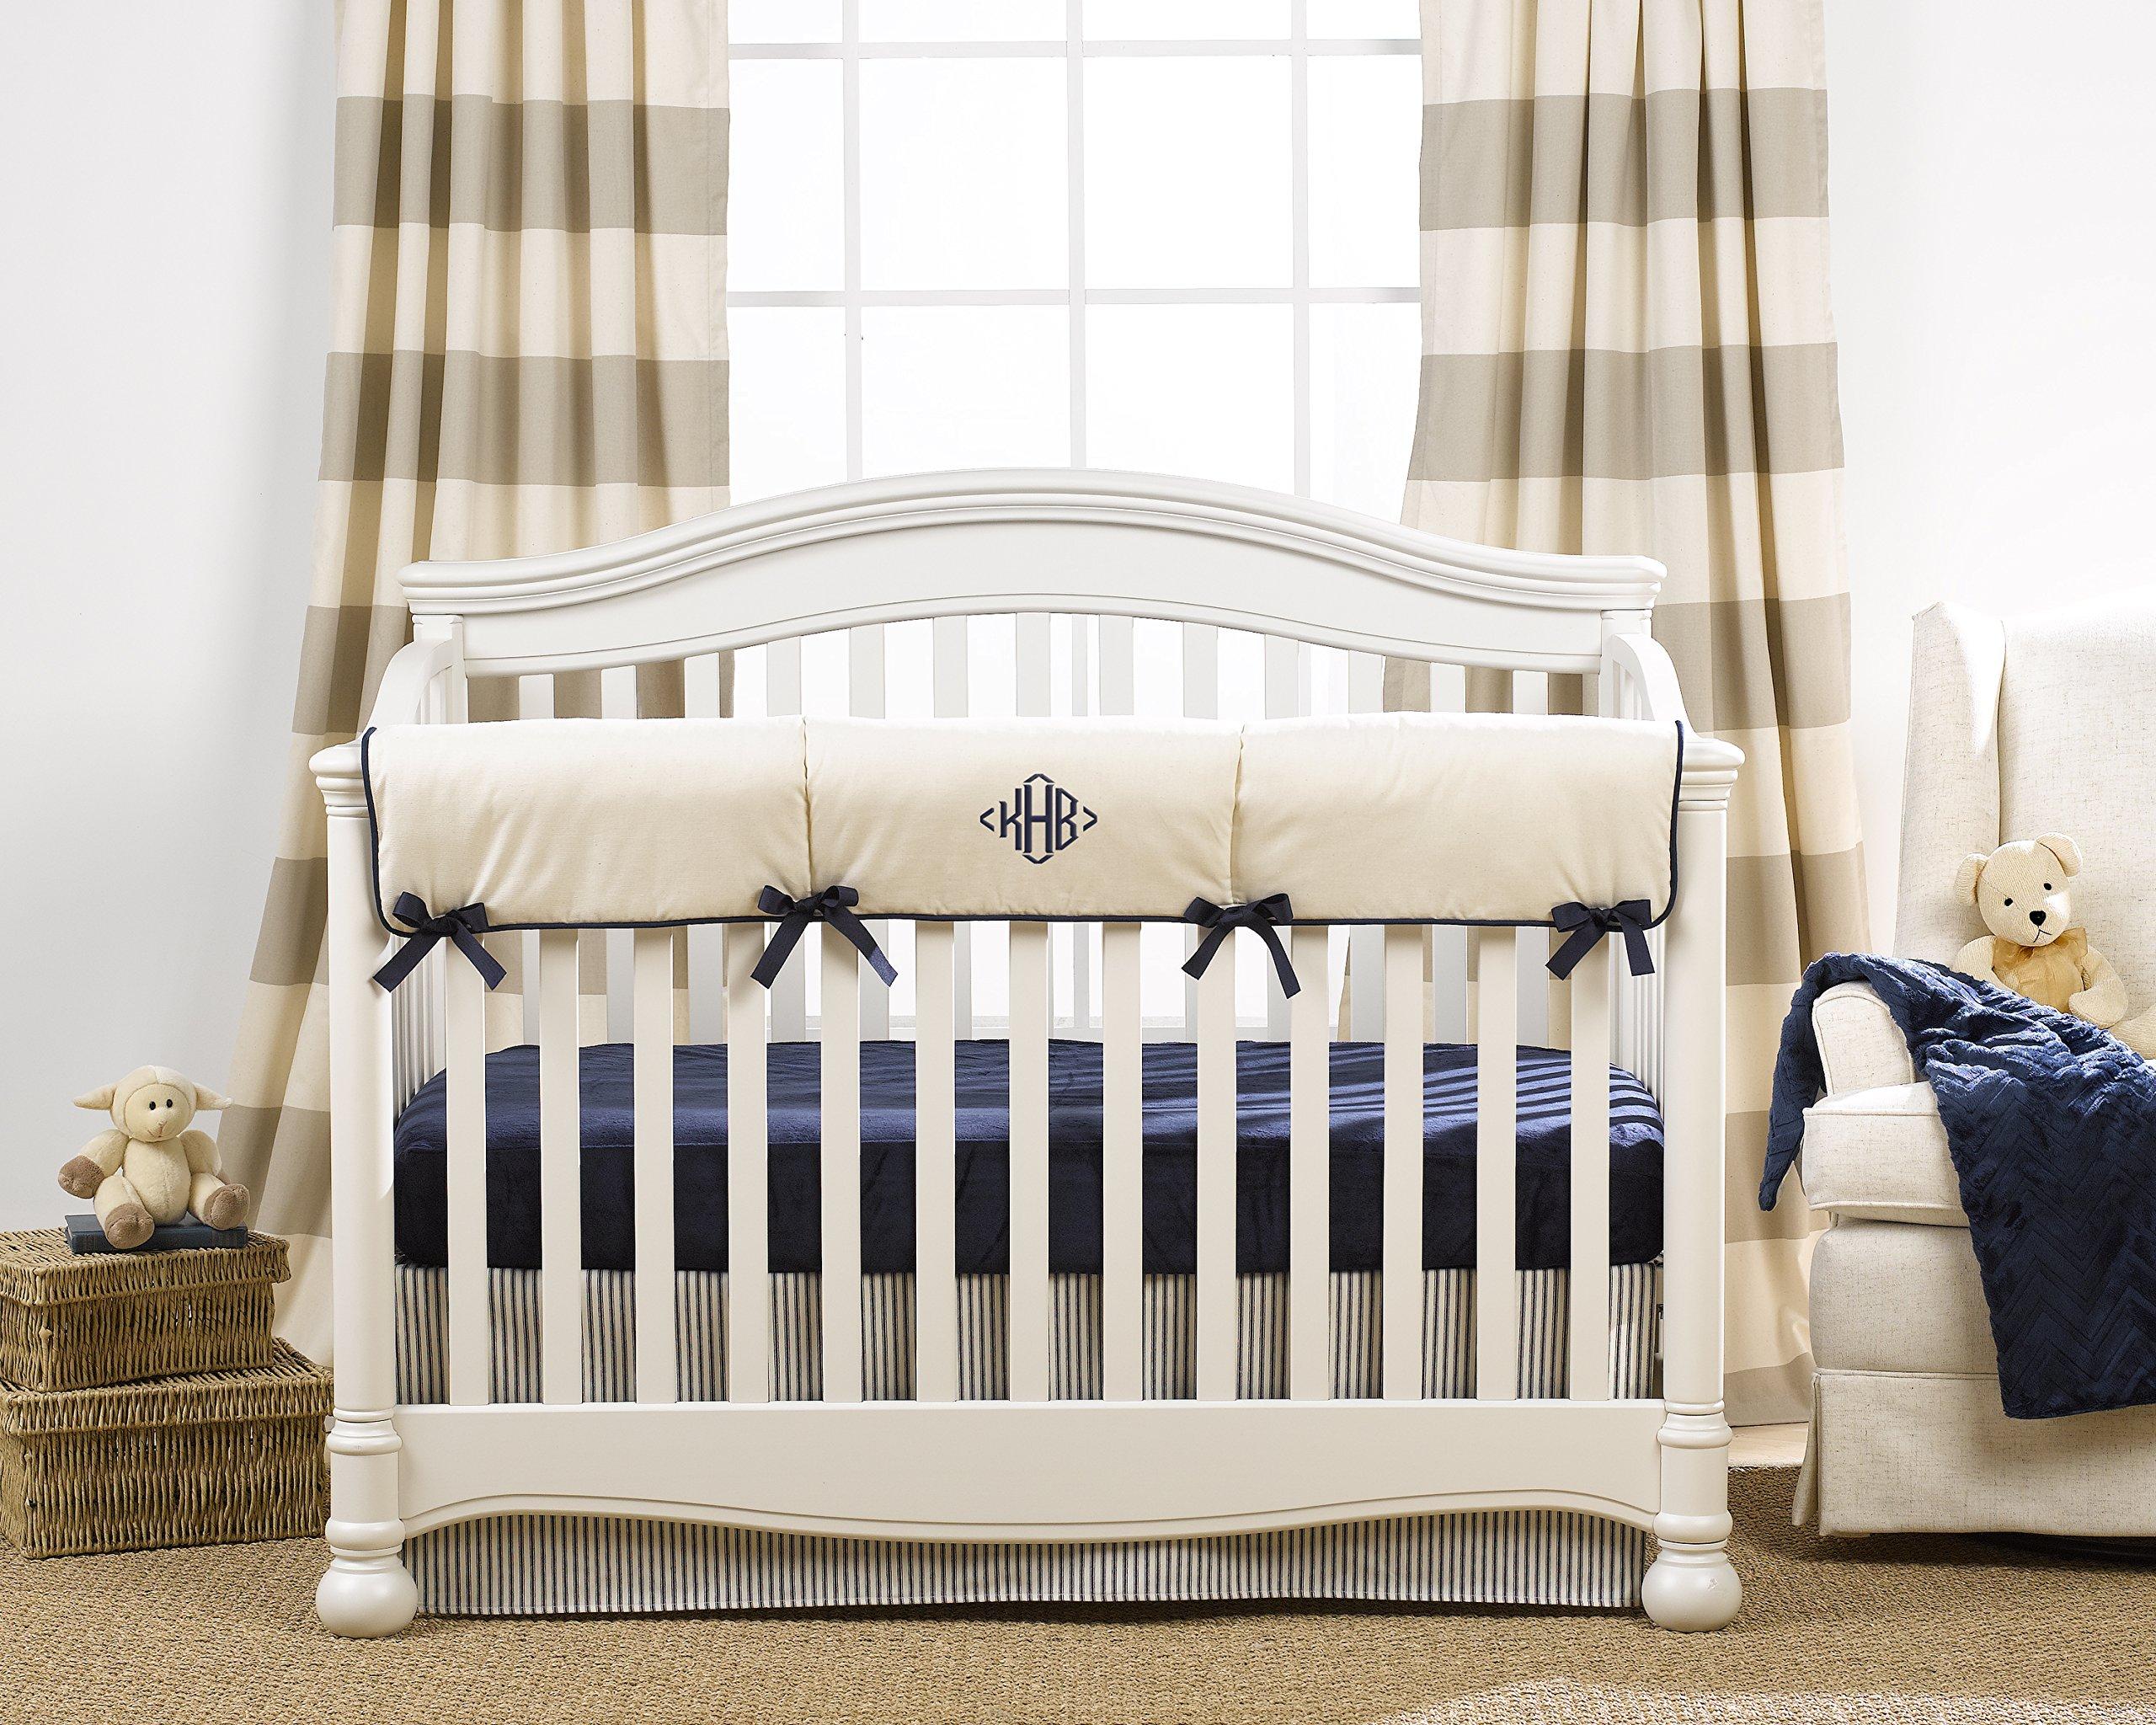 Canvas Crib Rail Cover (Navy Trim)